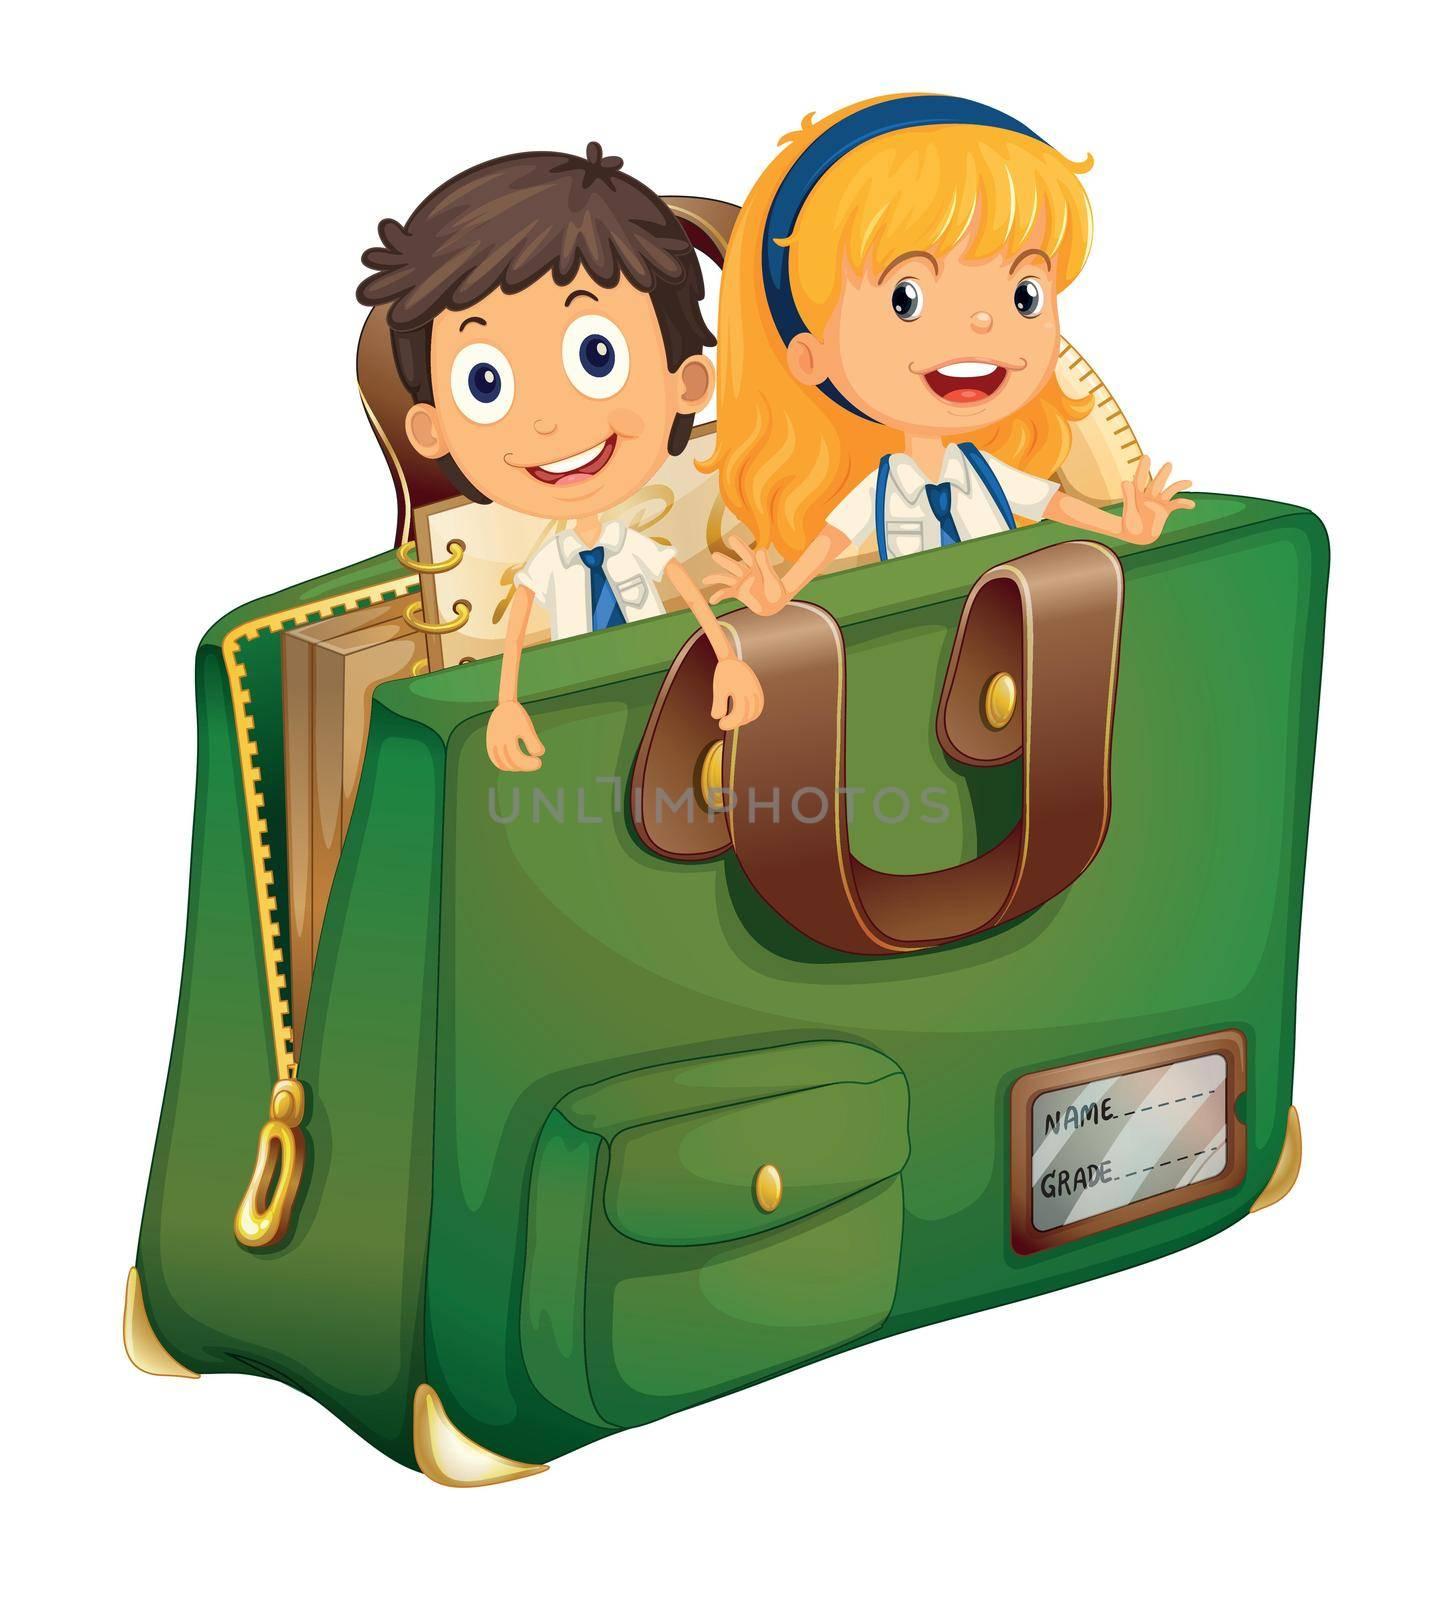 Illustration of kids in a schoolbag